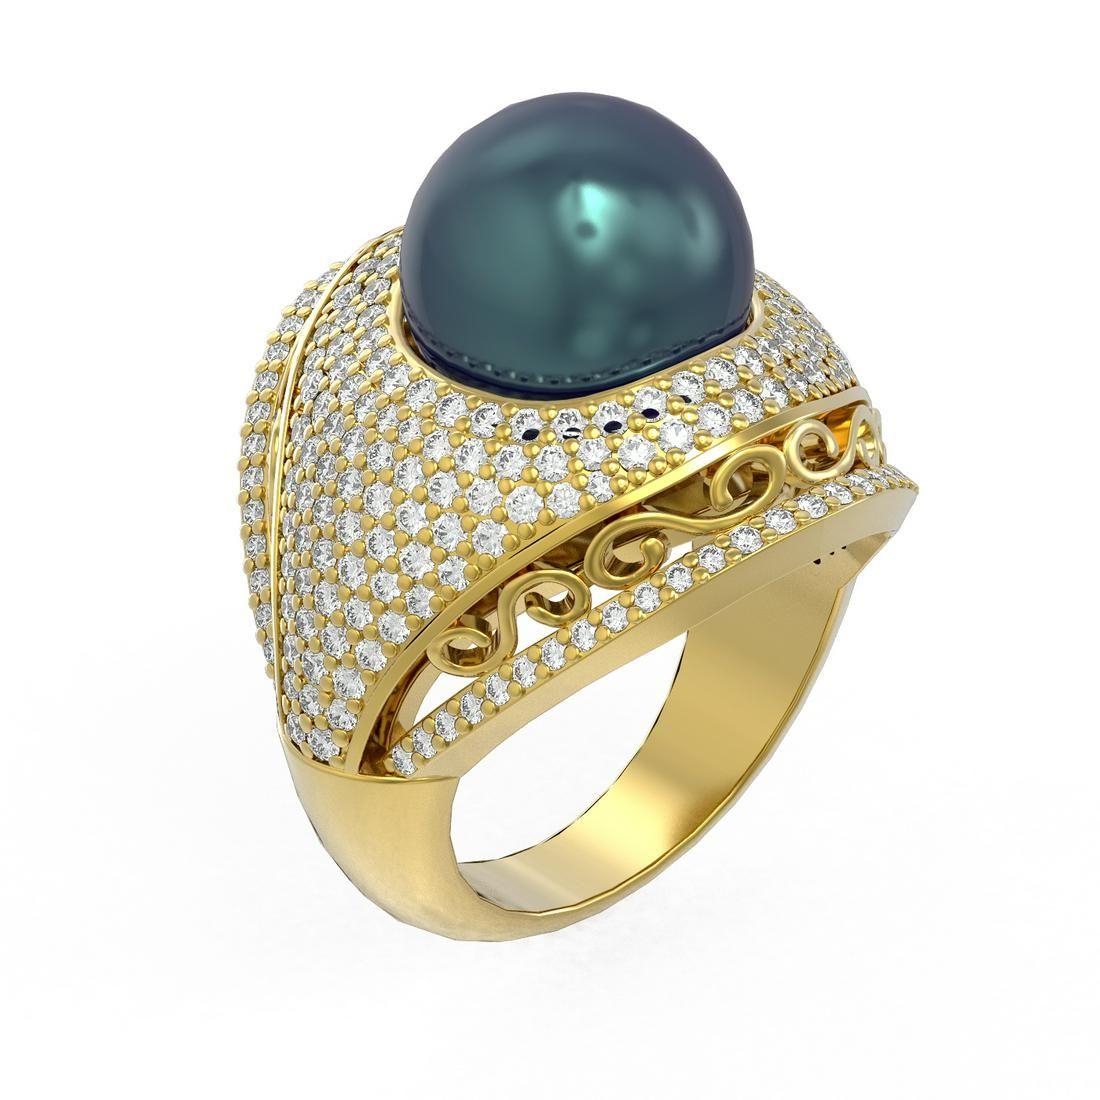 2.5 ctw Diamond & Pearl Ring 18K Yellow Gold -